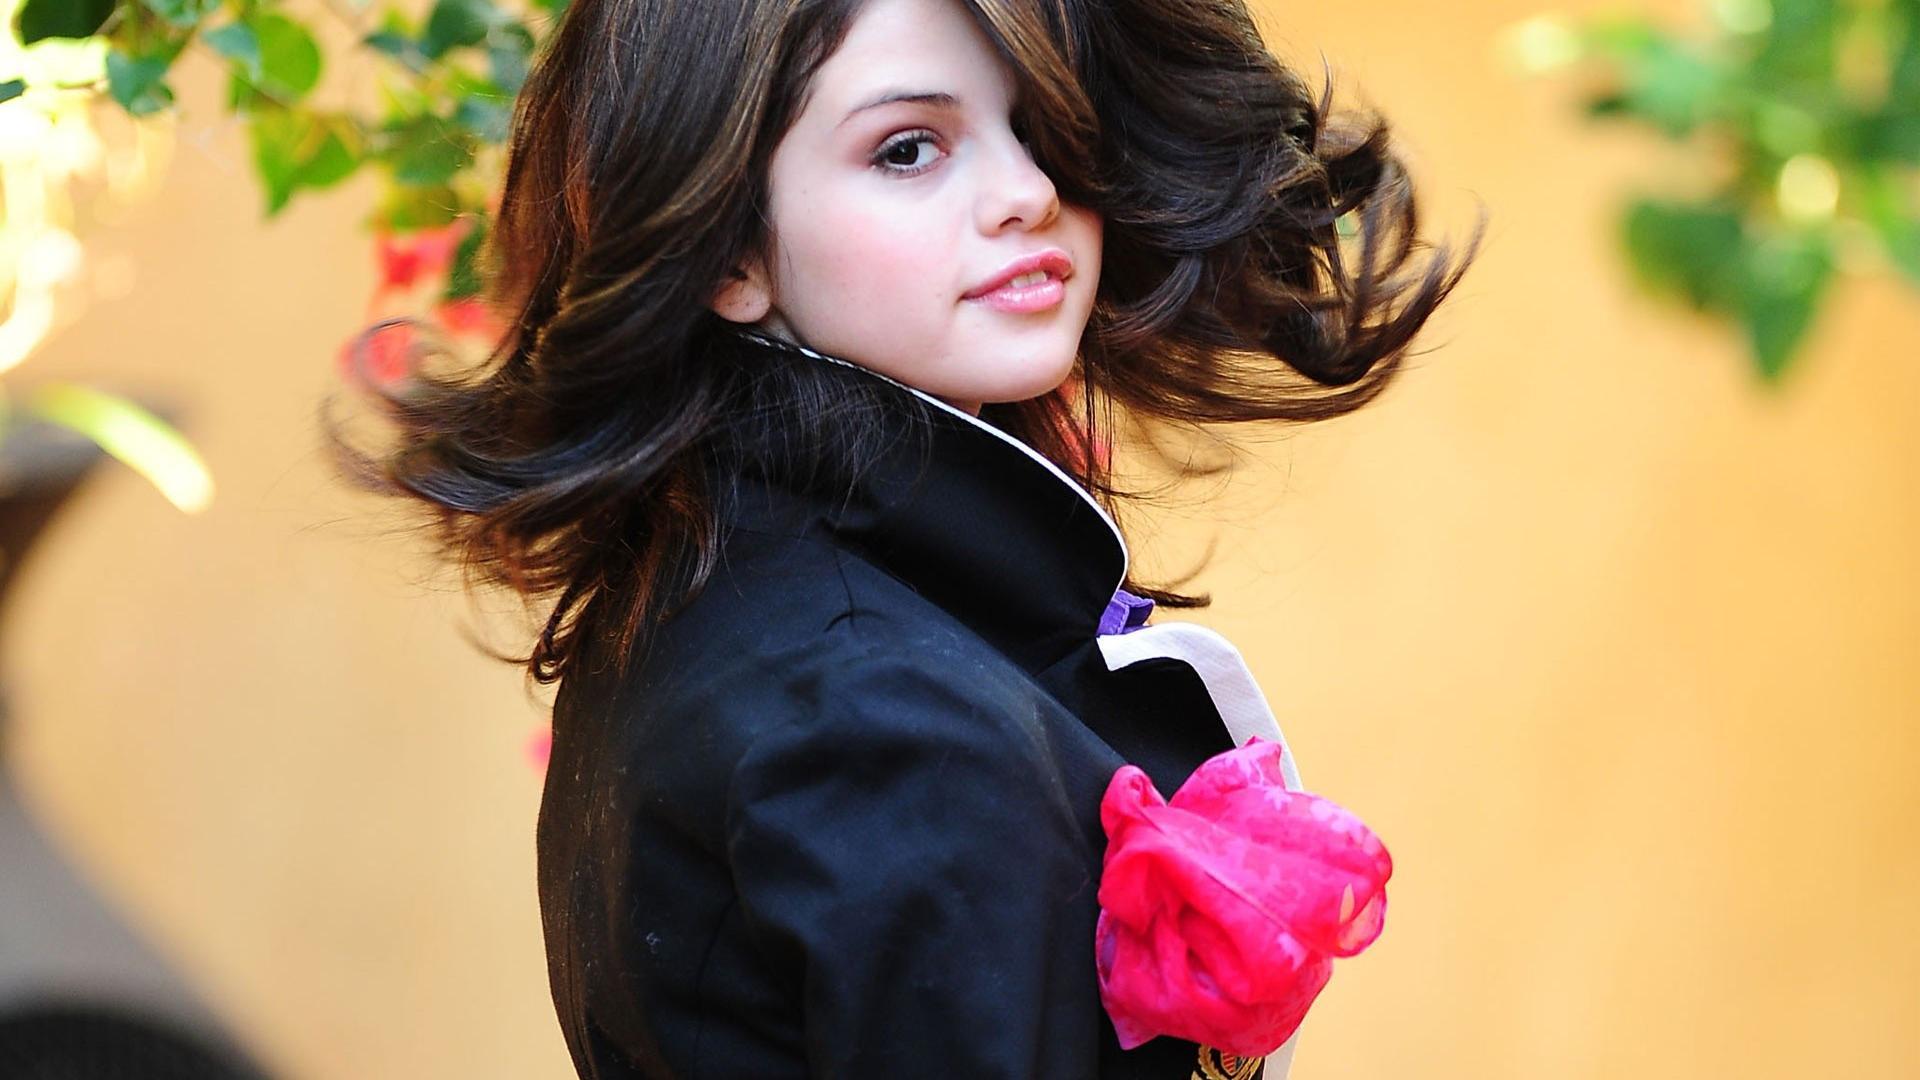 http://4.bp.blogspot.com/-kVAvxJ-Op3U/UOaJX-pHNkI/AAAAAAAABkg/rPhLYogIJqE/s4000/Selena-Gomez-2013-Cute-Widescreen-HD-Wallpaper-.jpg